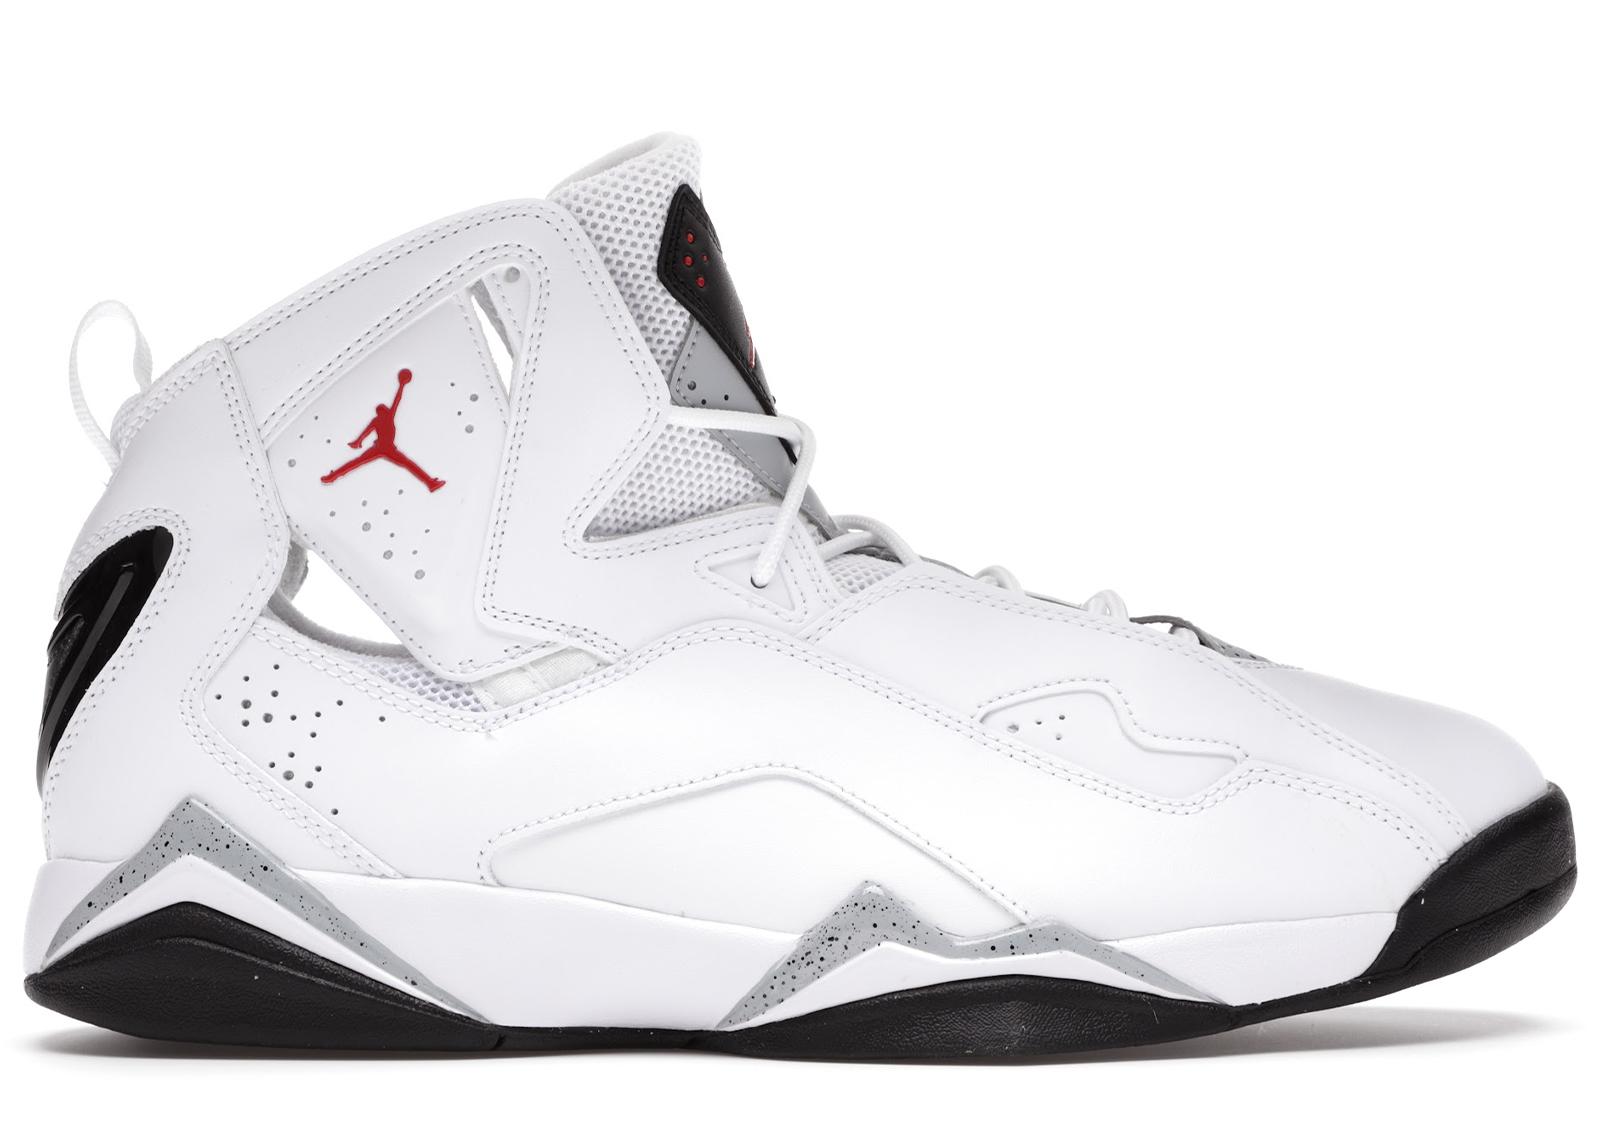 Jordan True Flight White Cement